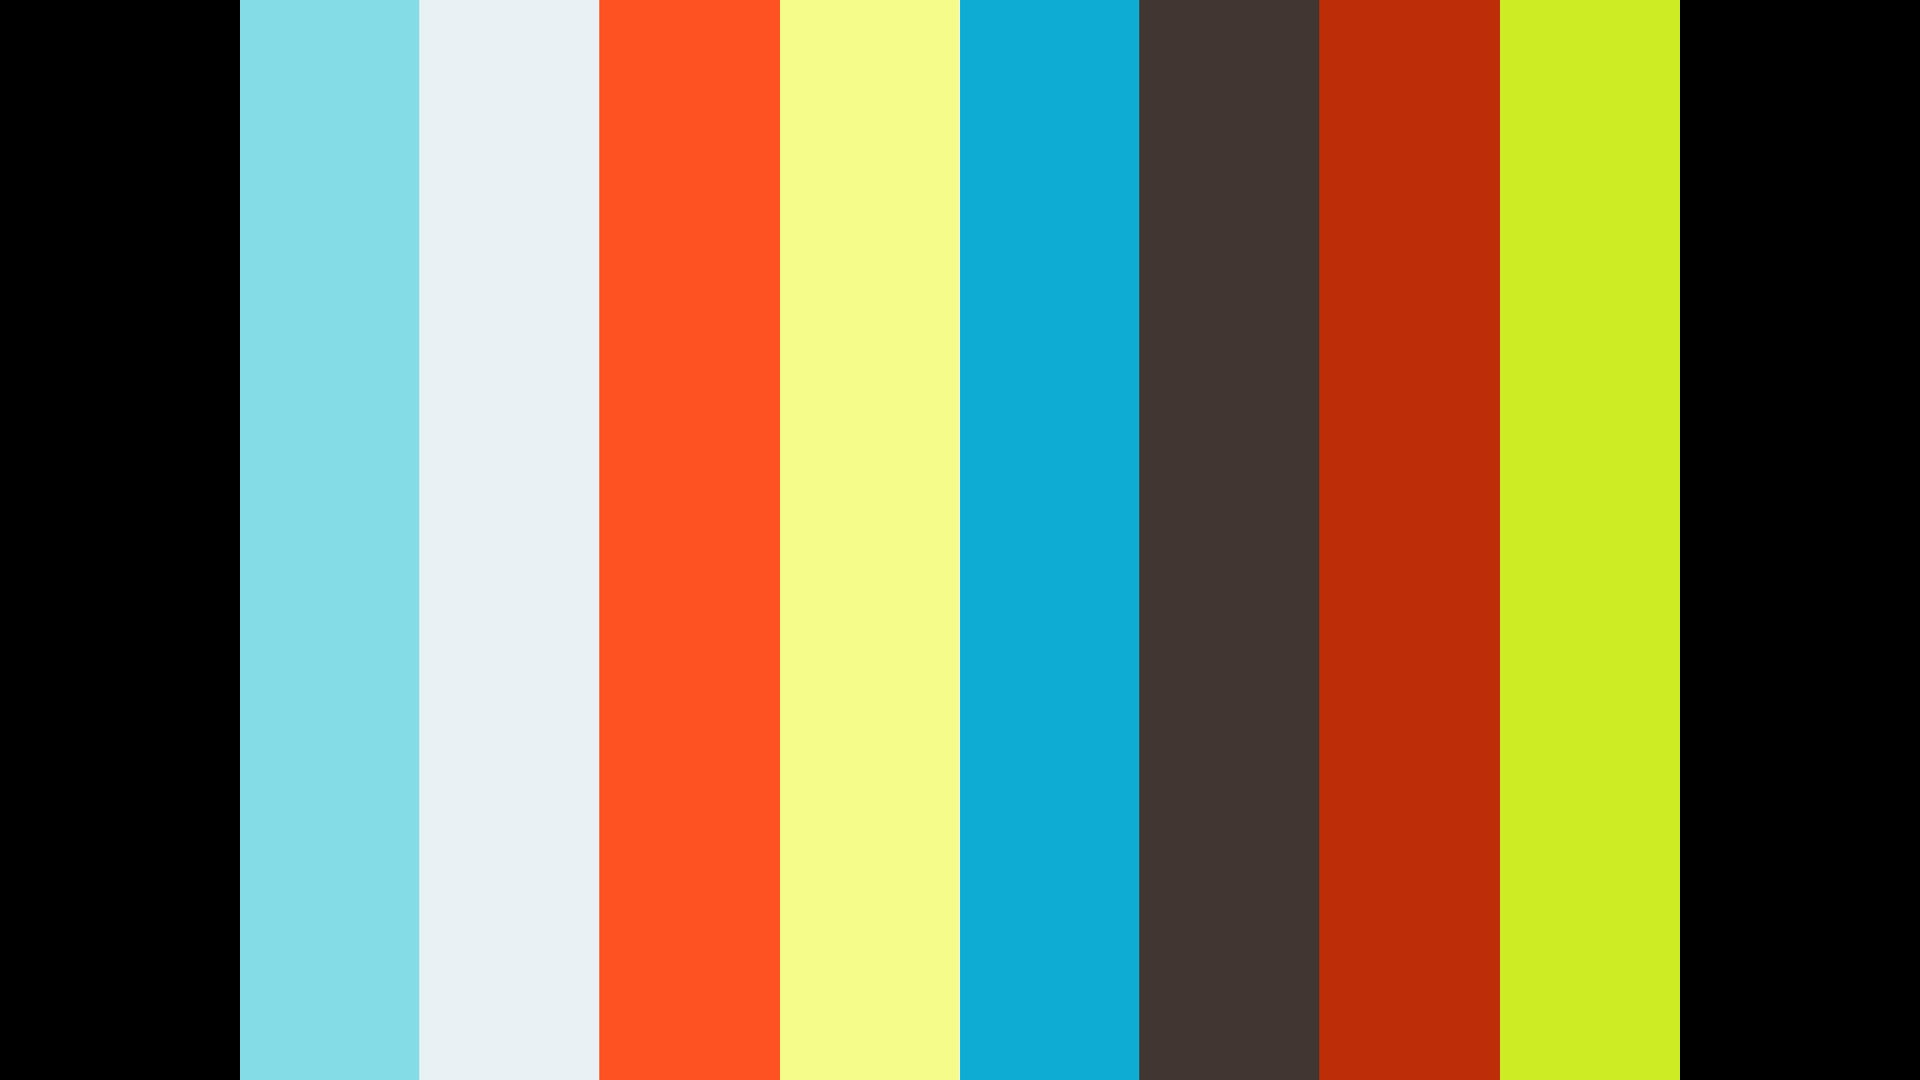 GE-Rainbow.mp4